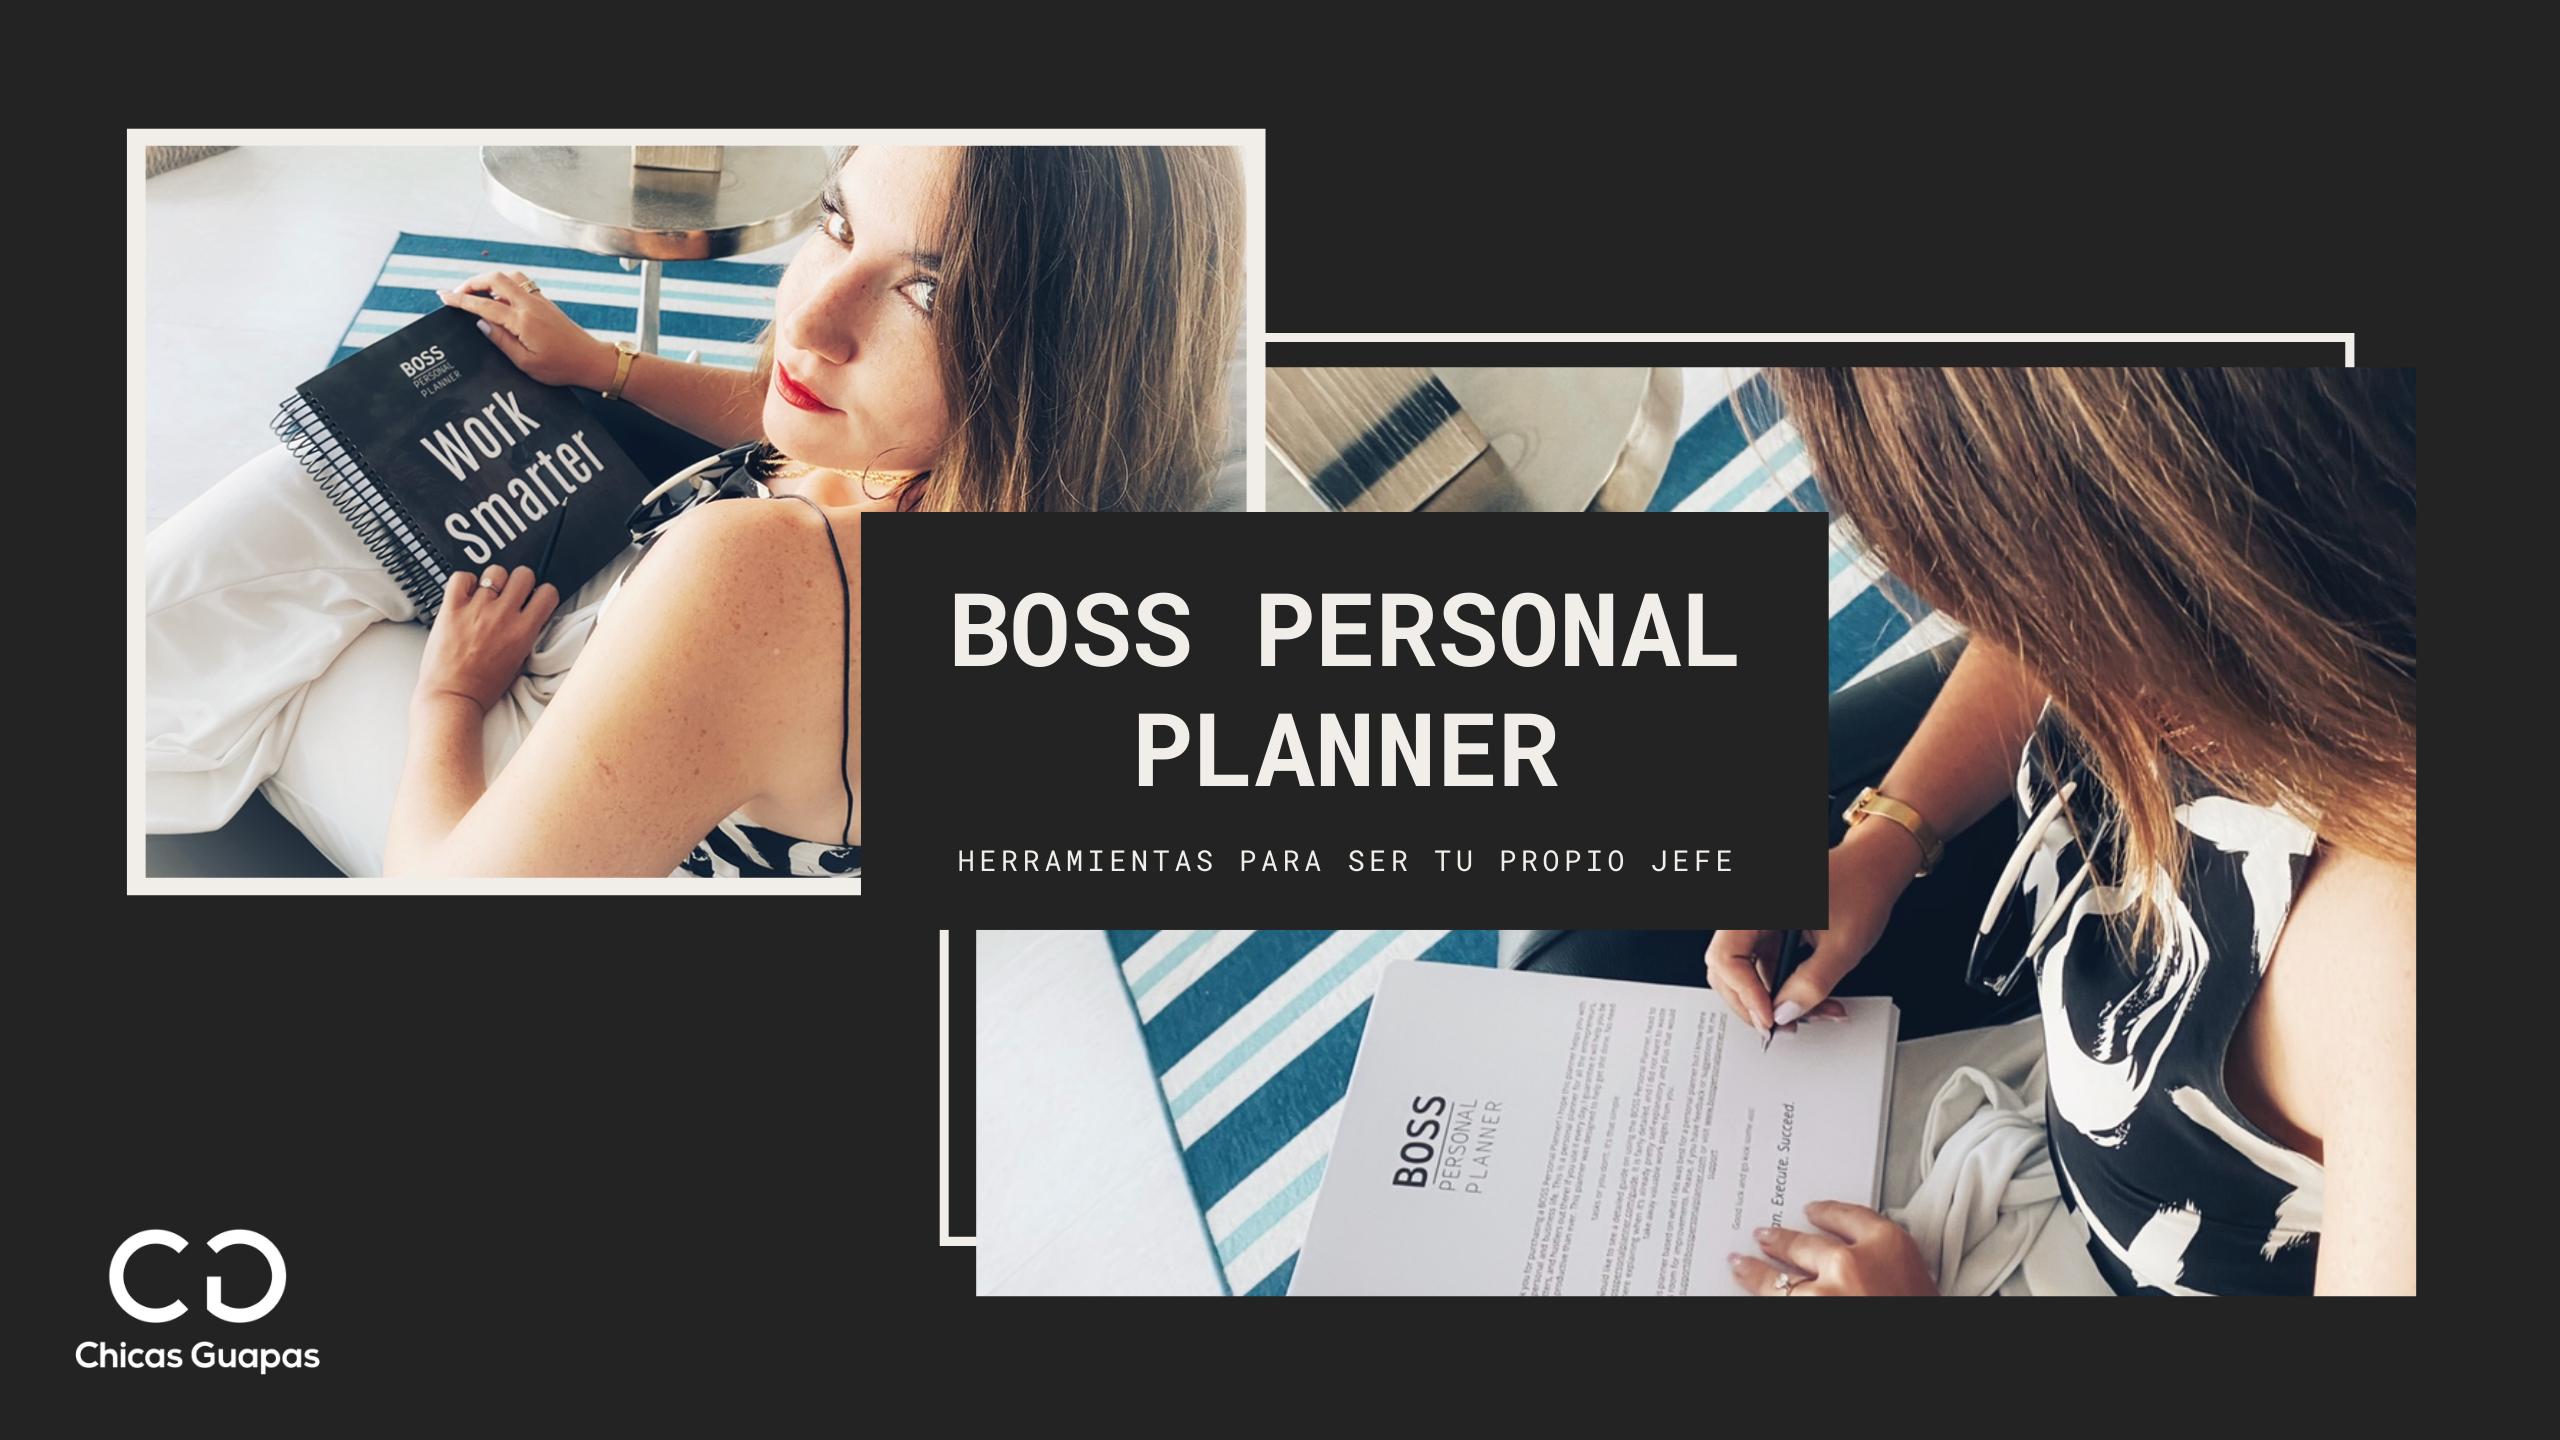 Boss Personal Planner: sé tu propio jefe